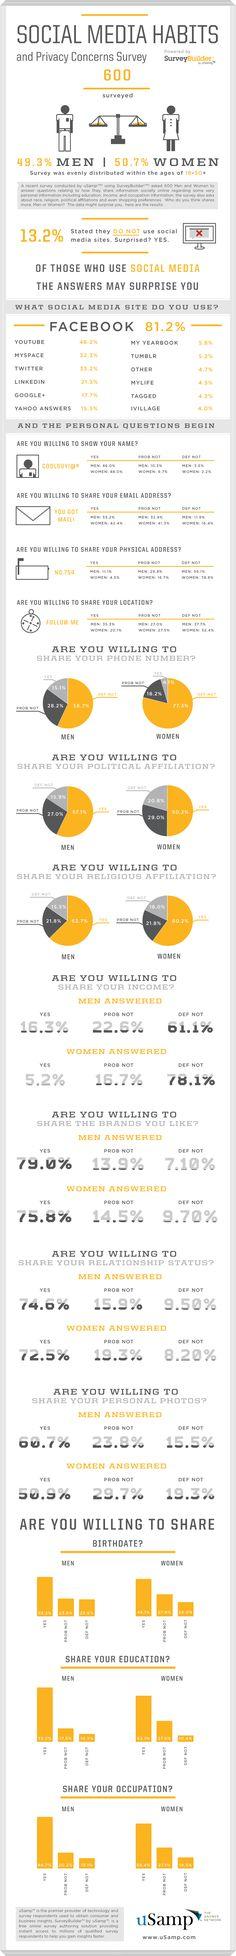 SOCIAL MEDIA HABITS and Privacy Concerns Survey